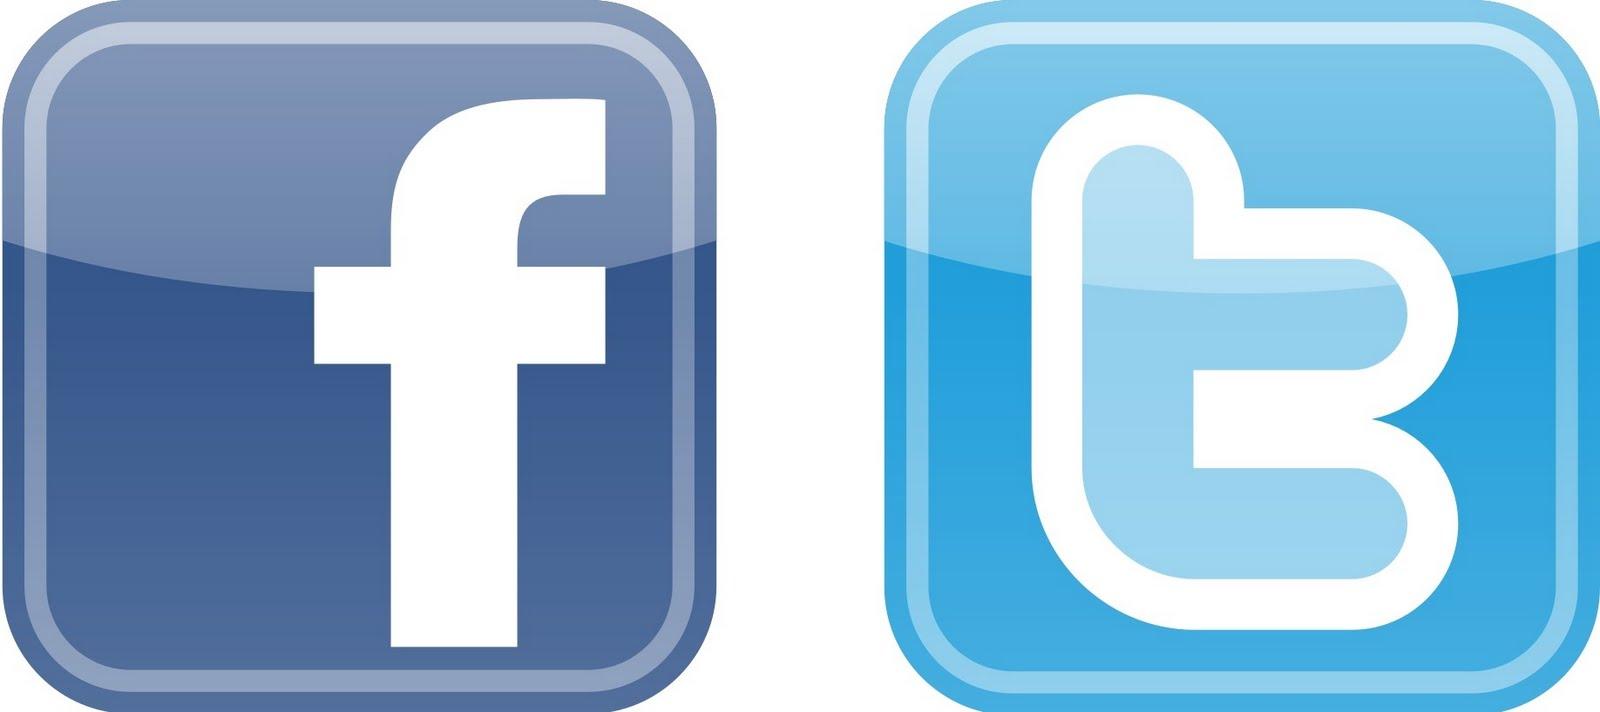 Like, Share, Follow, Retweet on Social Media